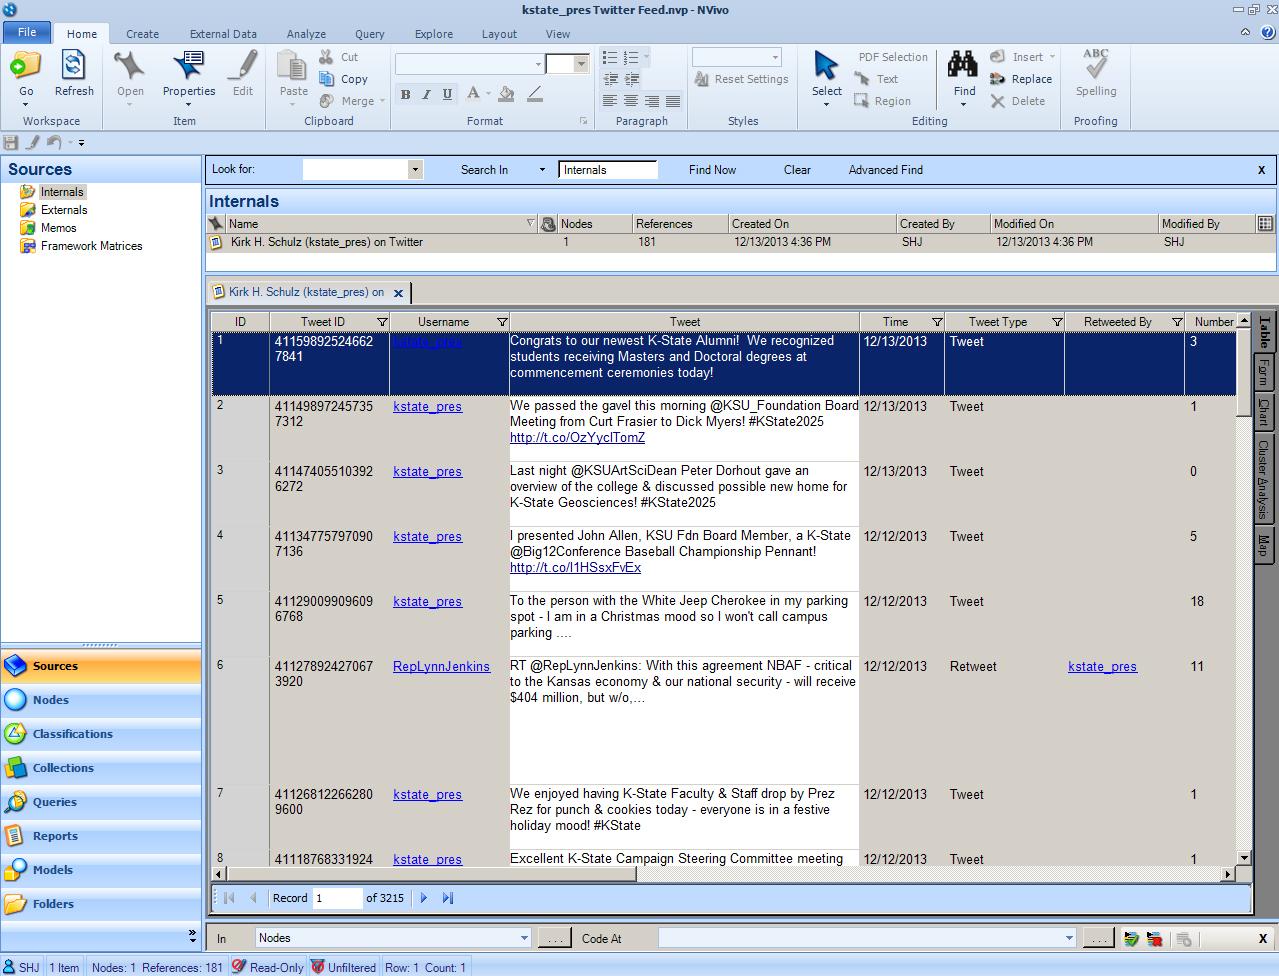 NVivo qualitative data analysis software